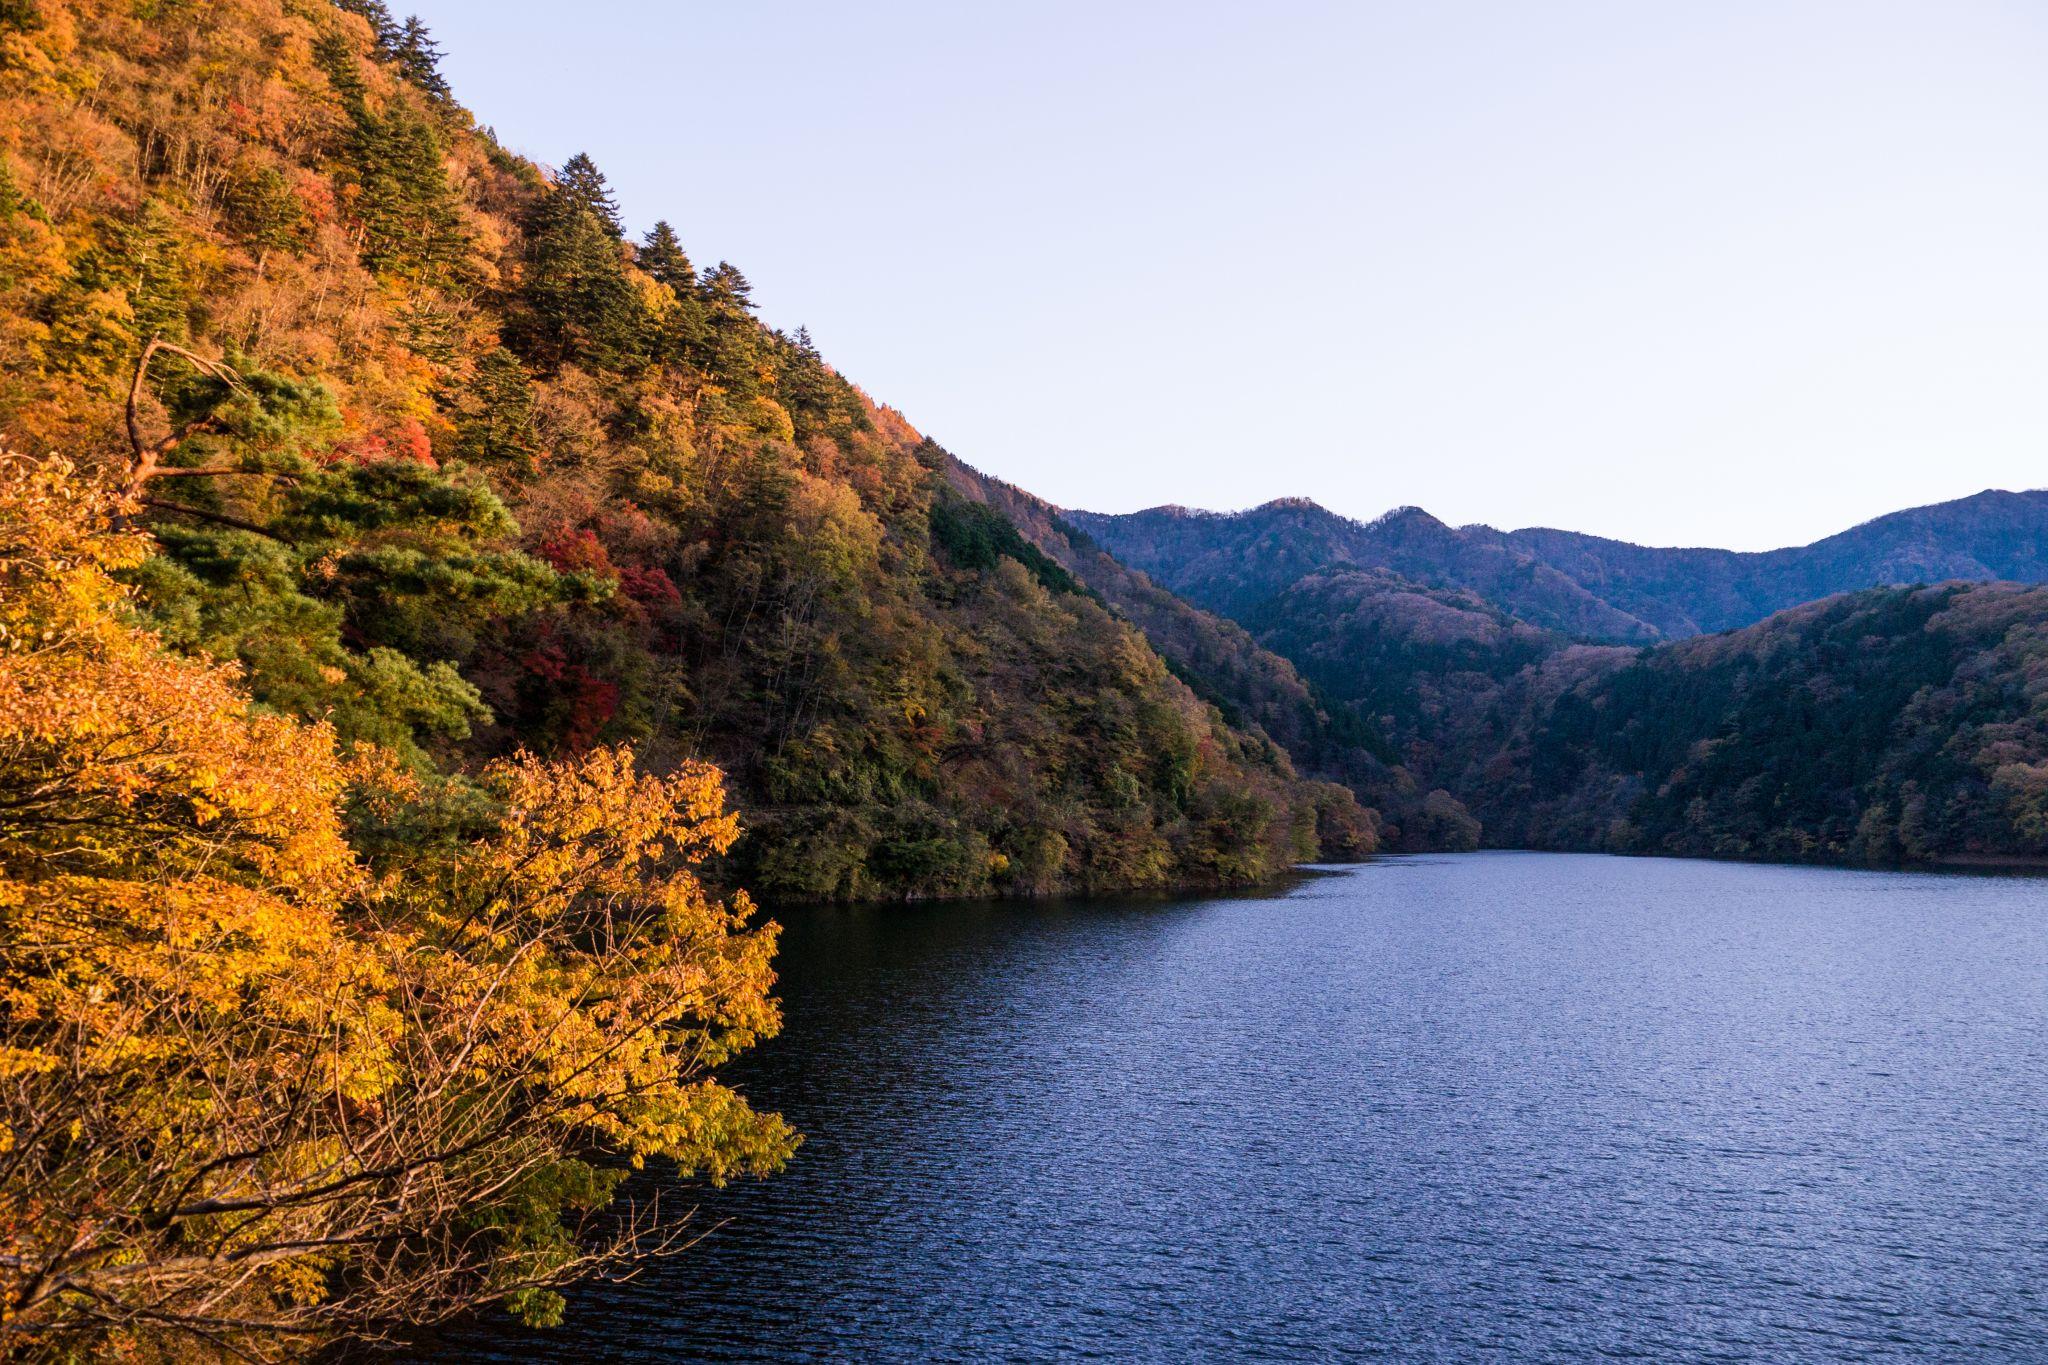 Okutama lake, Japan